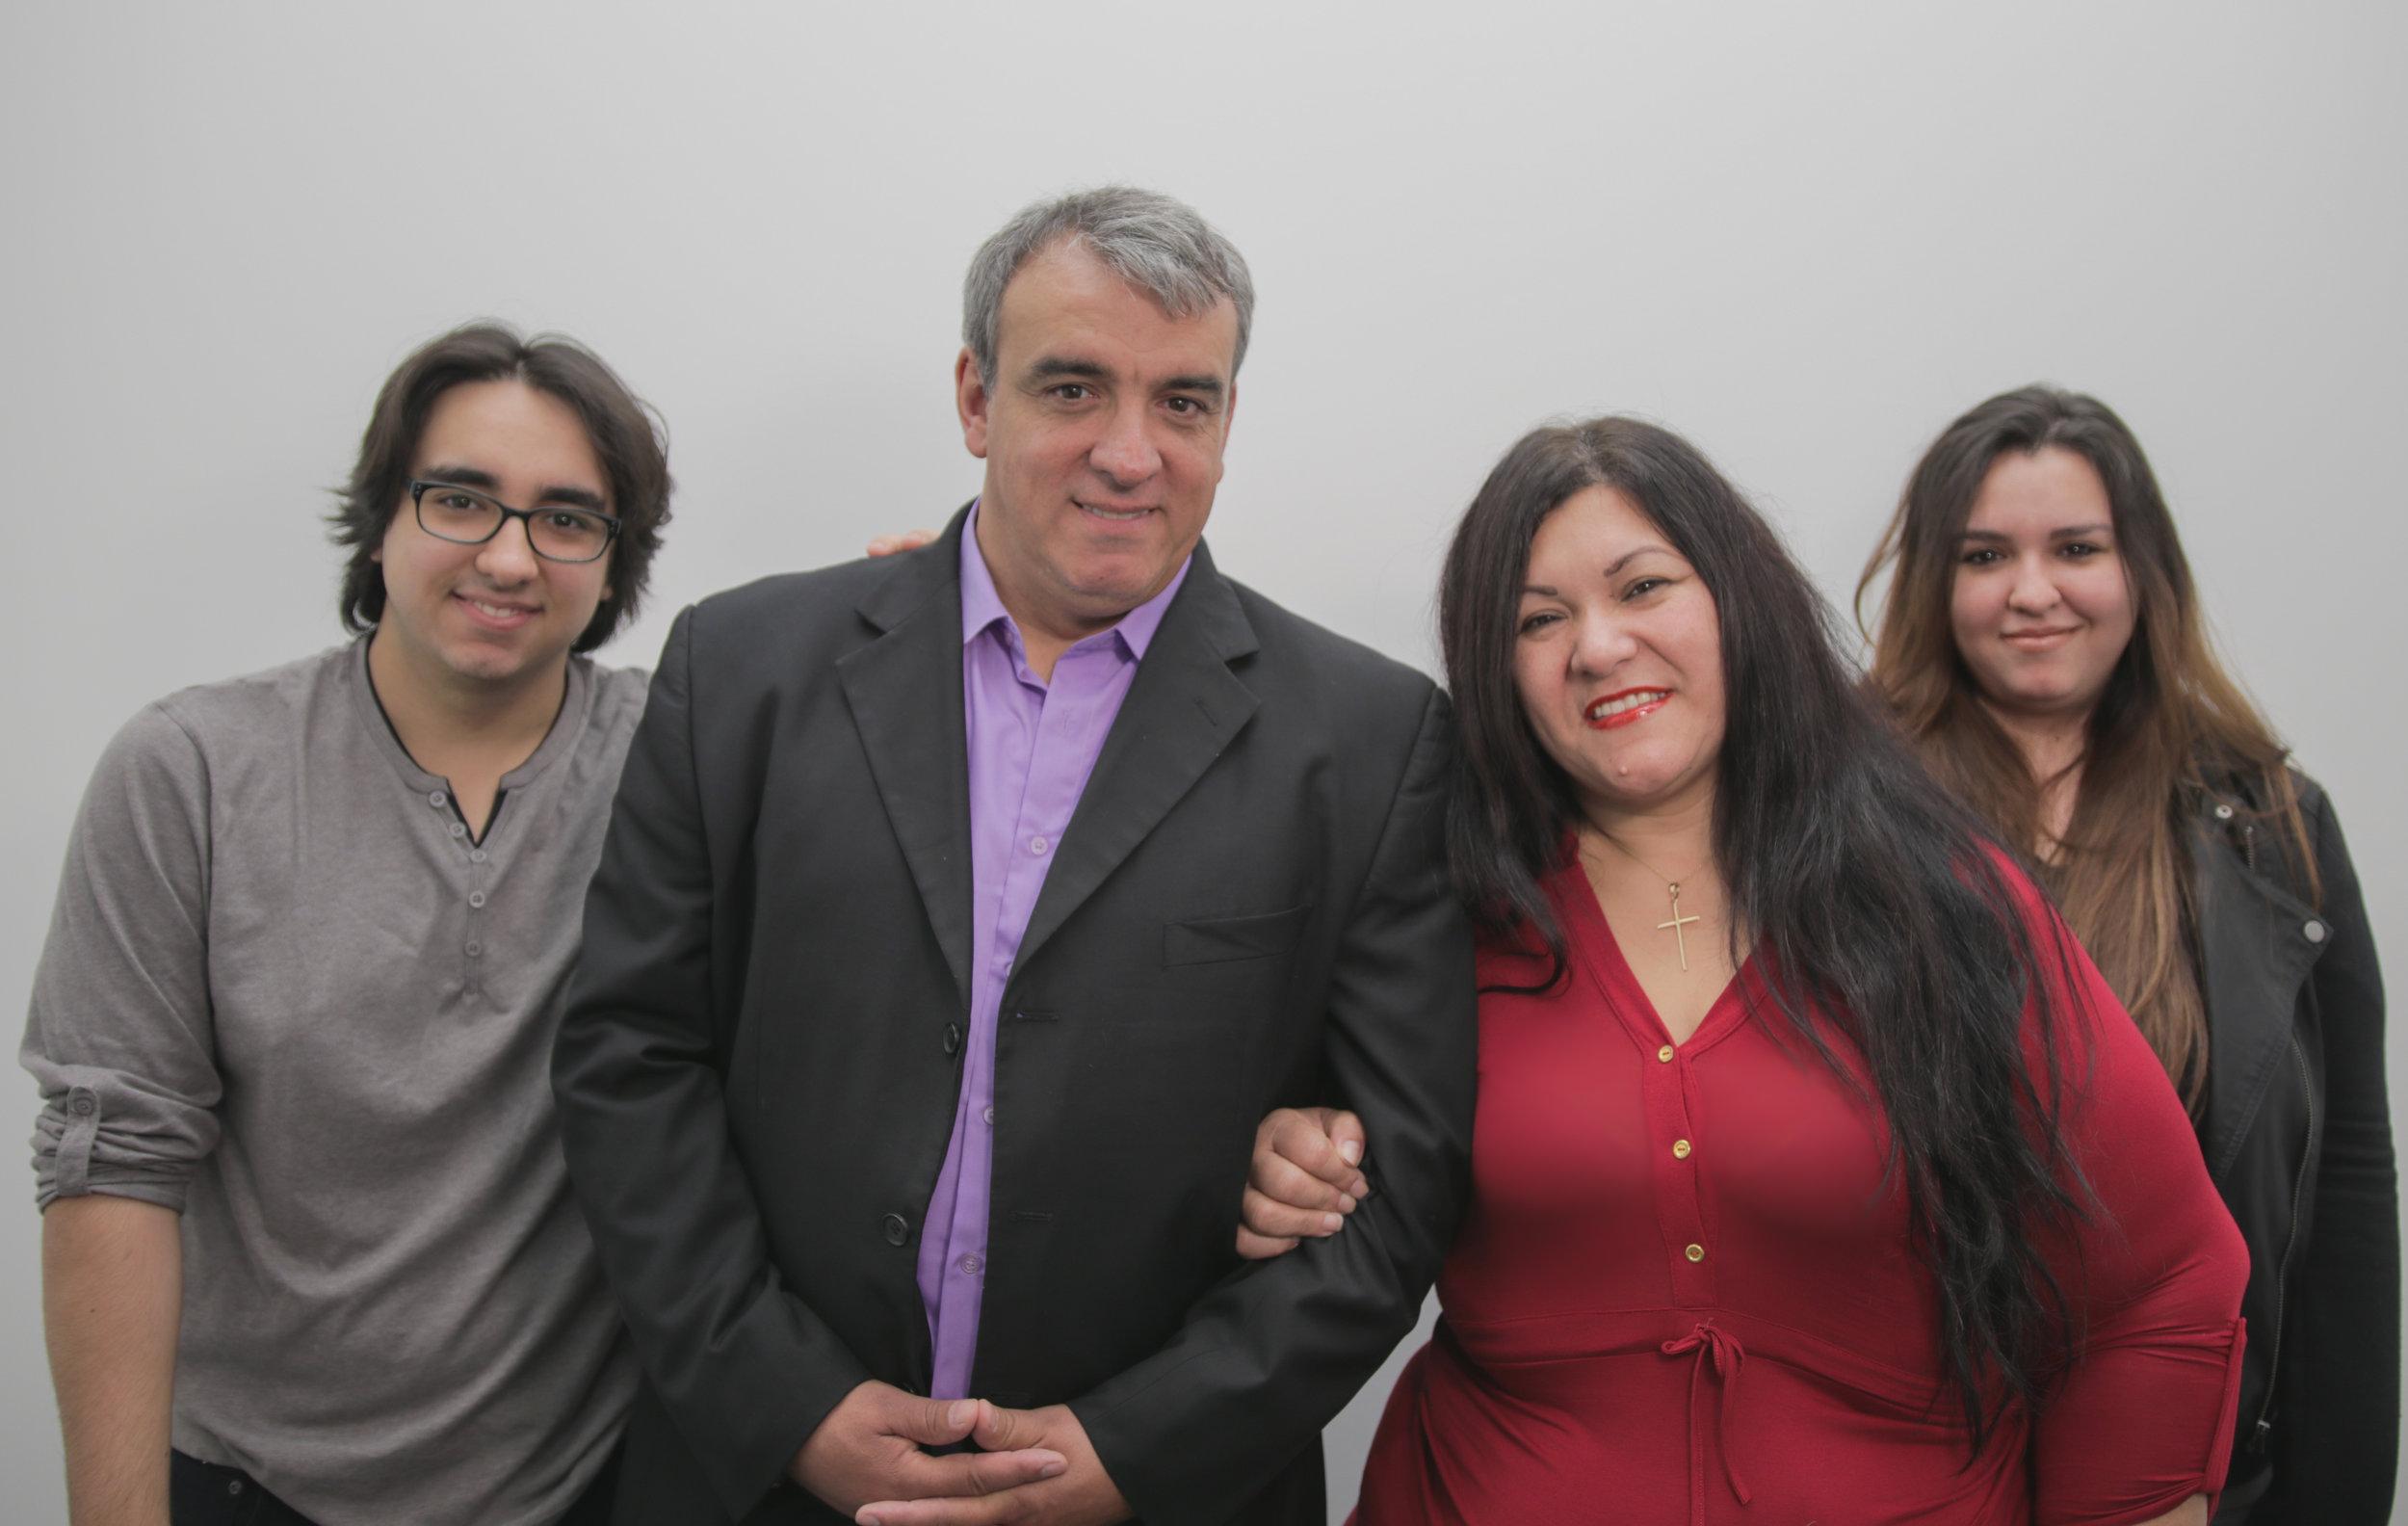 Cetrulo Family